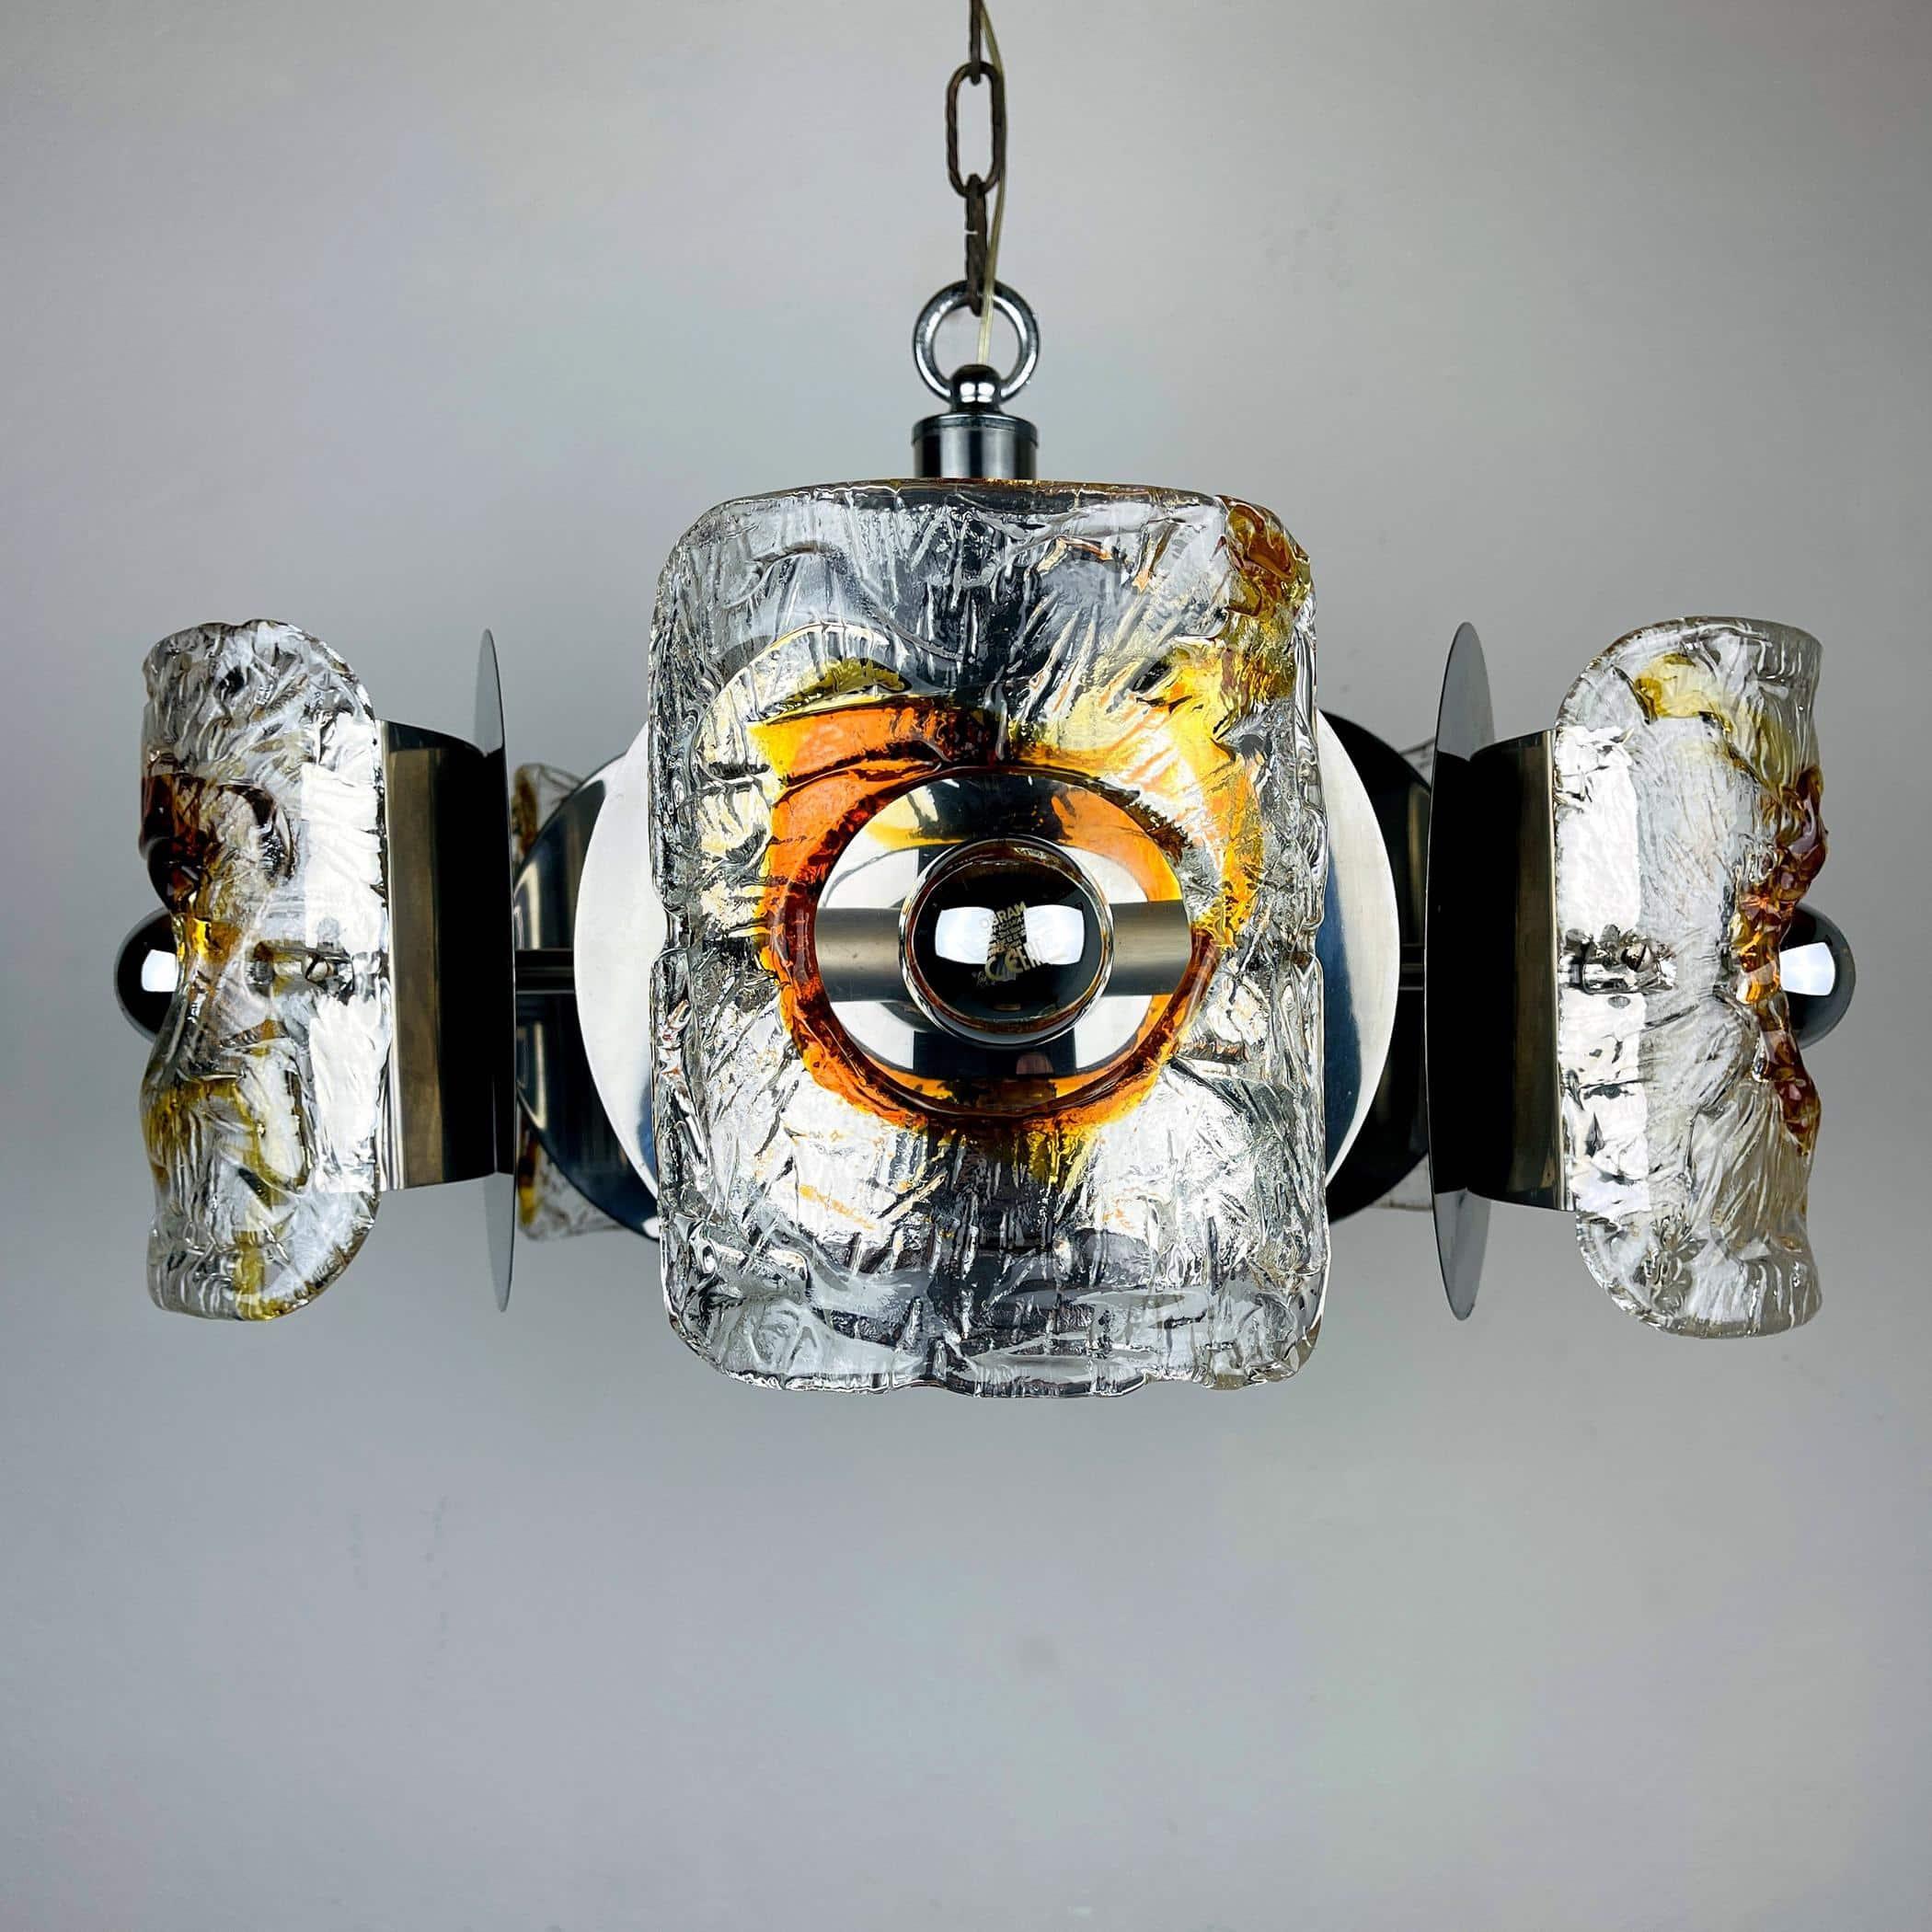 Mid-century amber Murano chrome chandelier Mazzega by Toni Zuccheri Italy 1970s Space age Sputnik atomic design